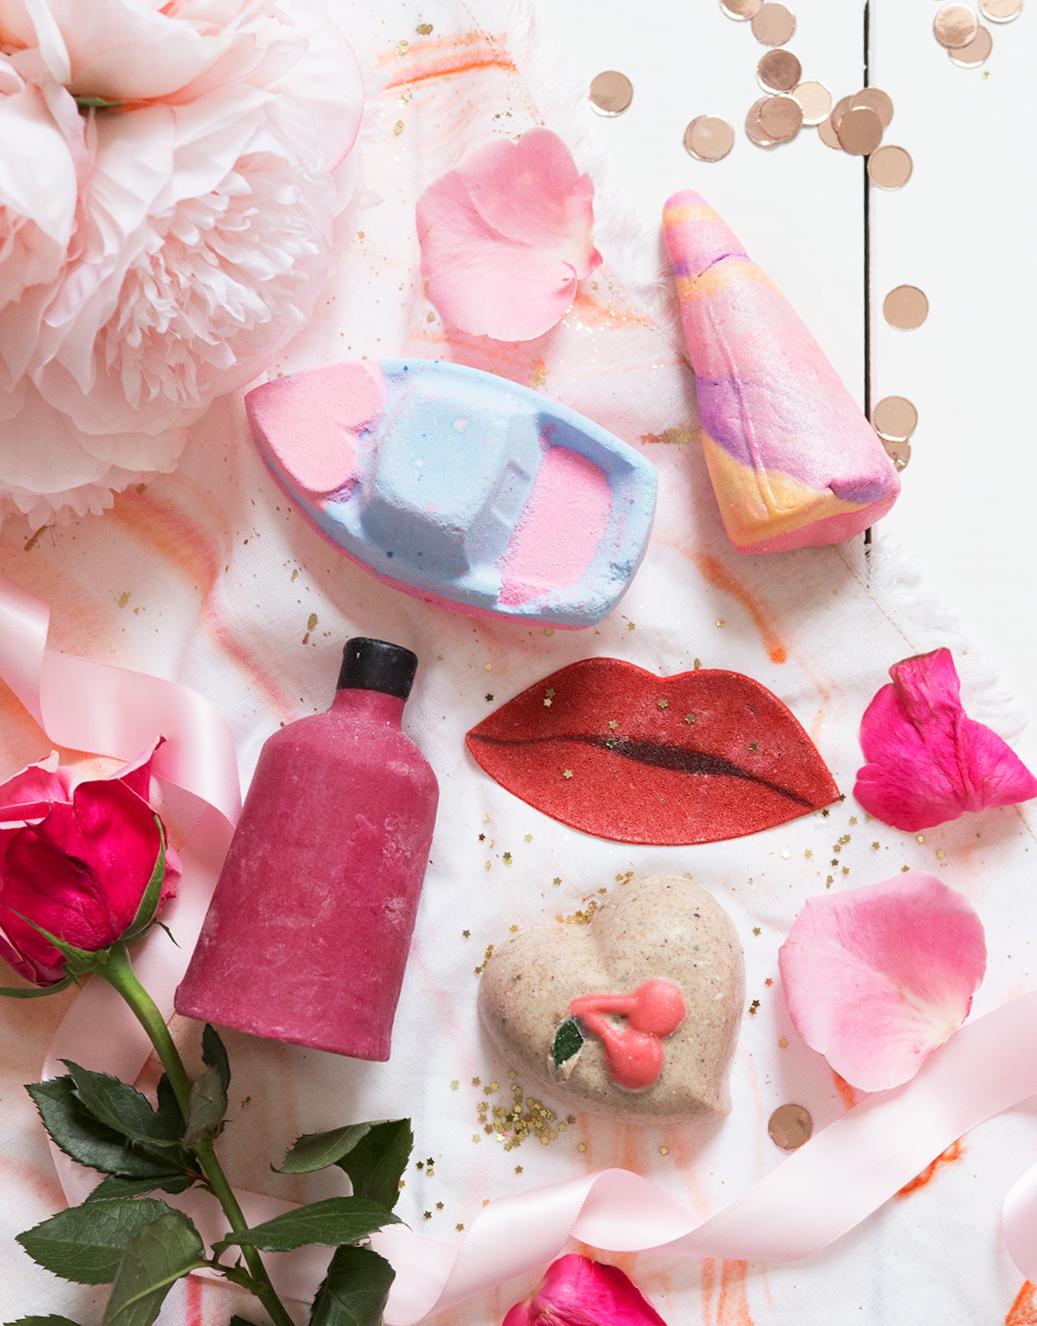 lush valentines 2018